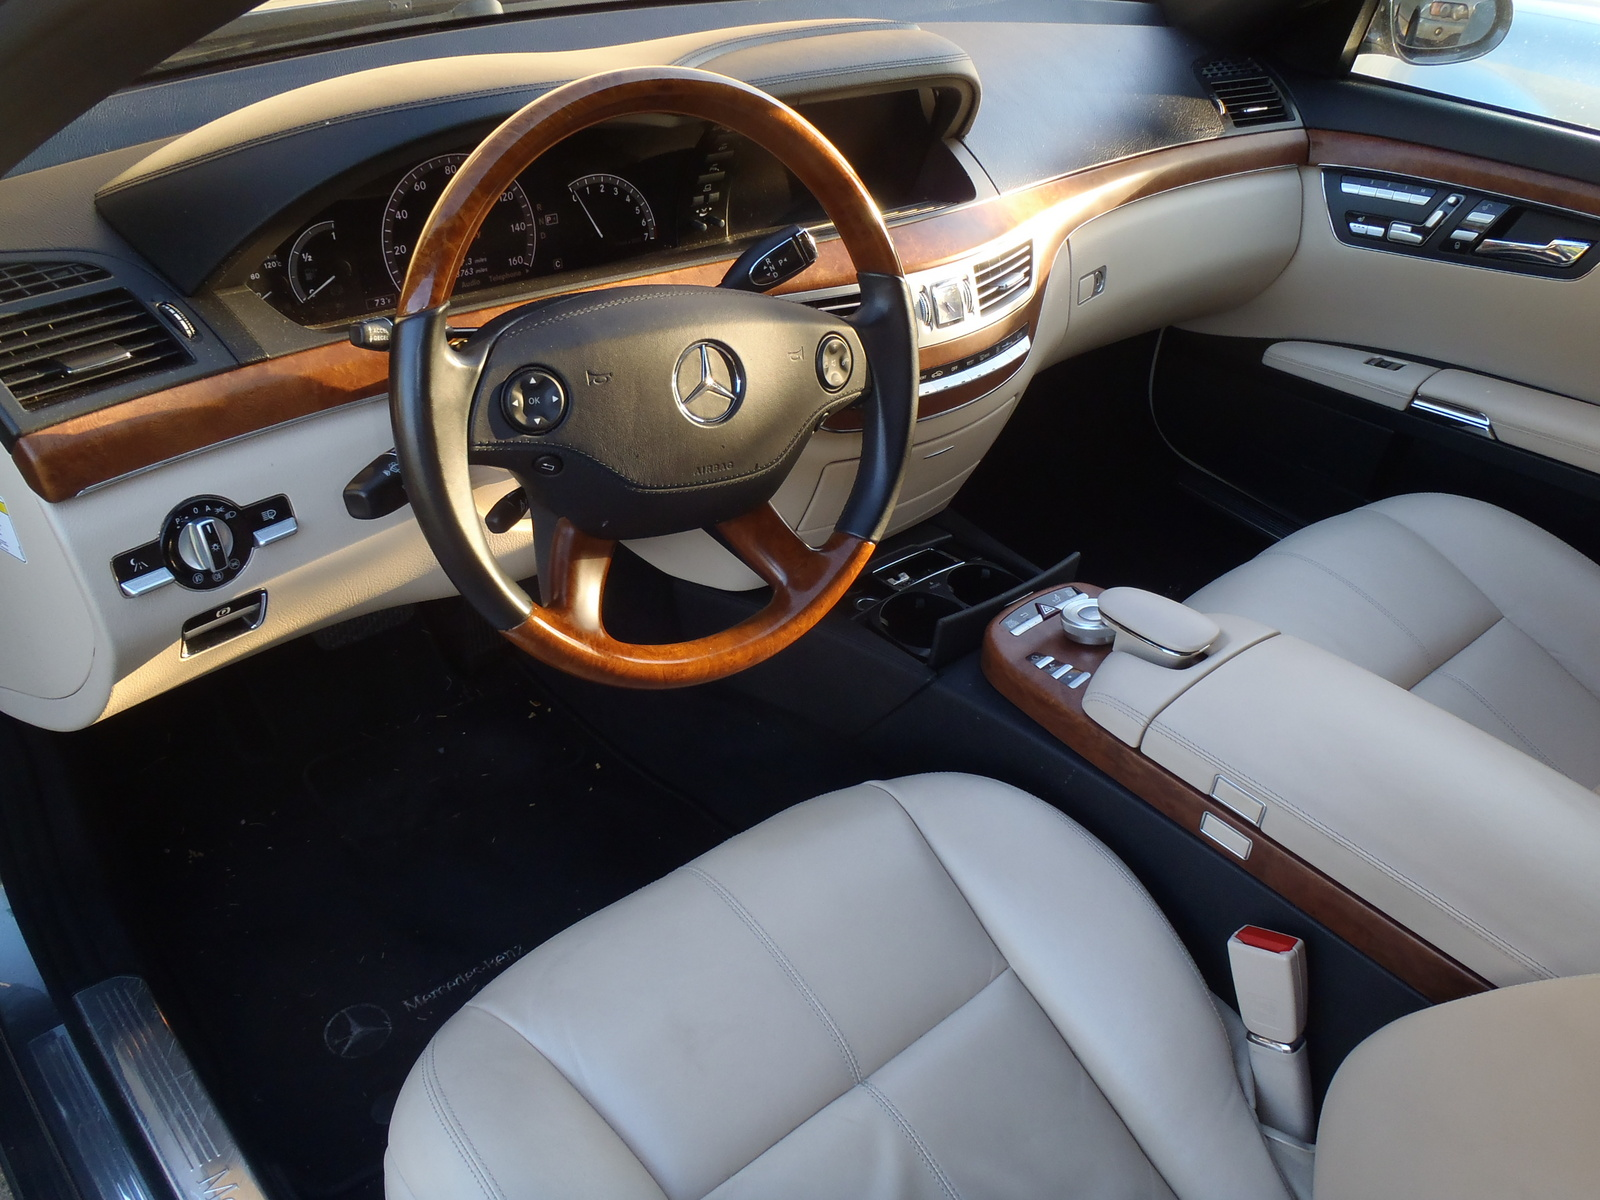 2007 Mercedes-Benz S-Class - Pictures - CarGurus